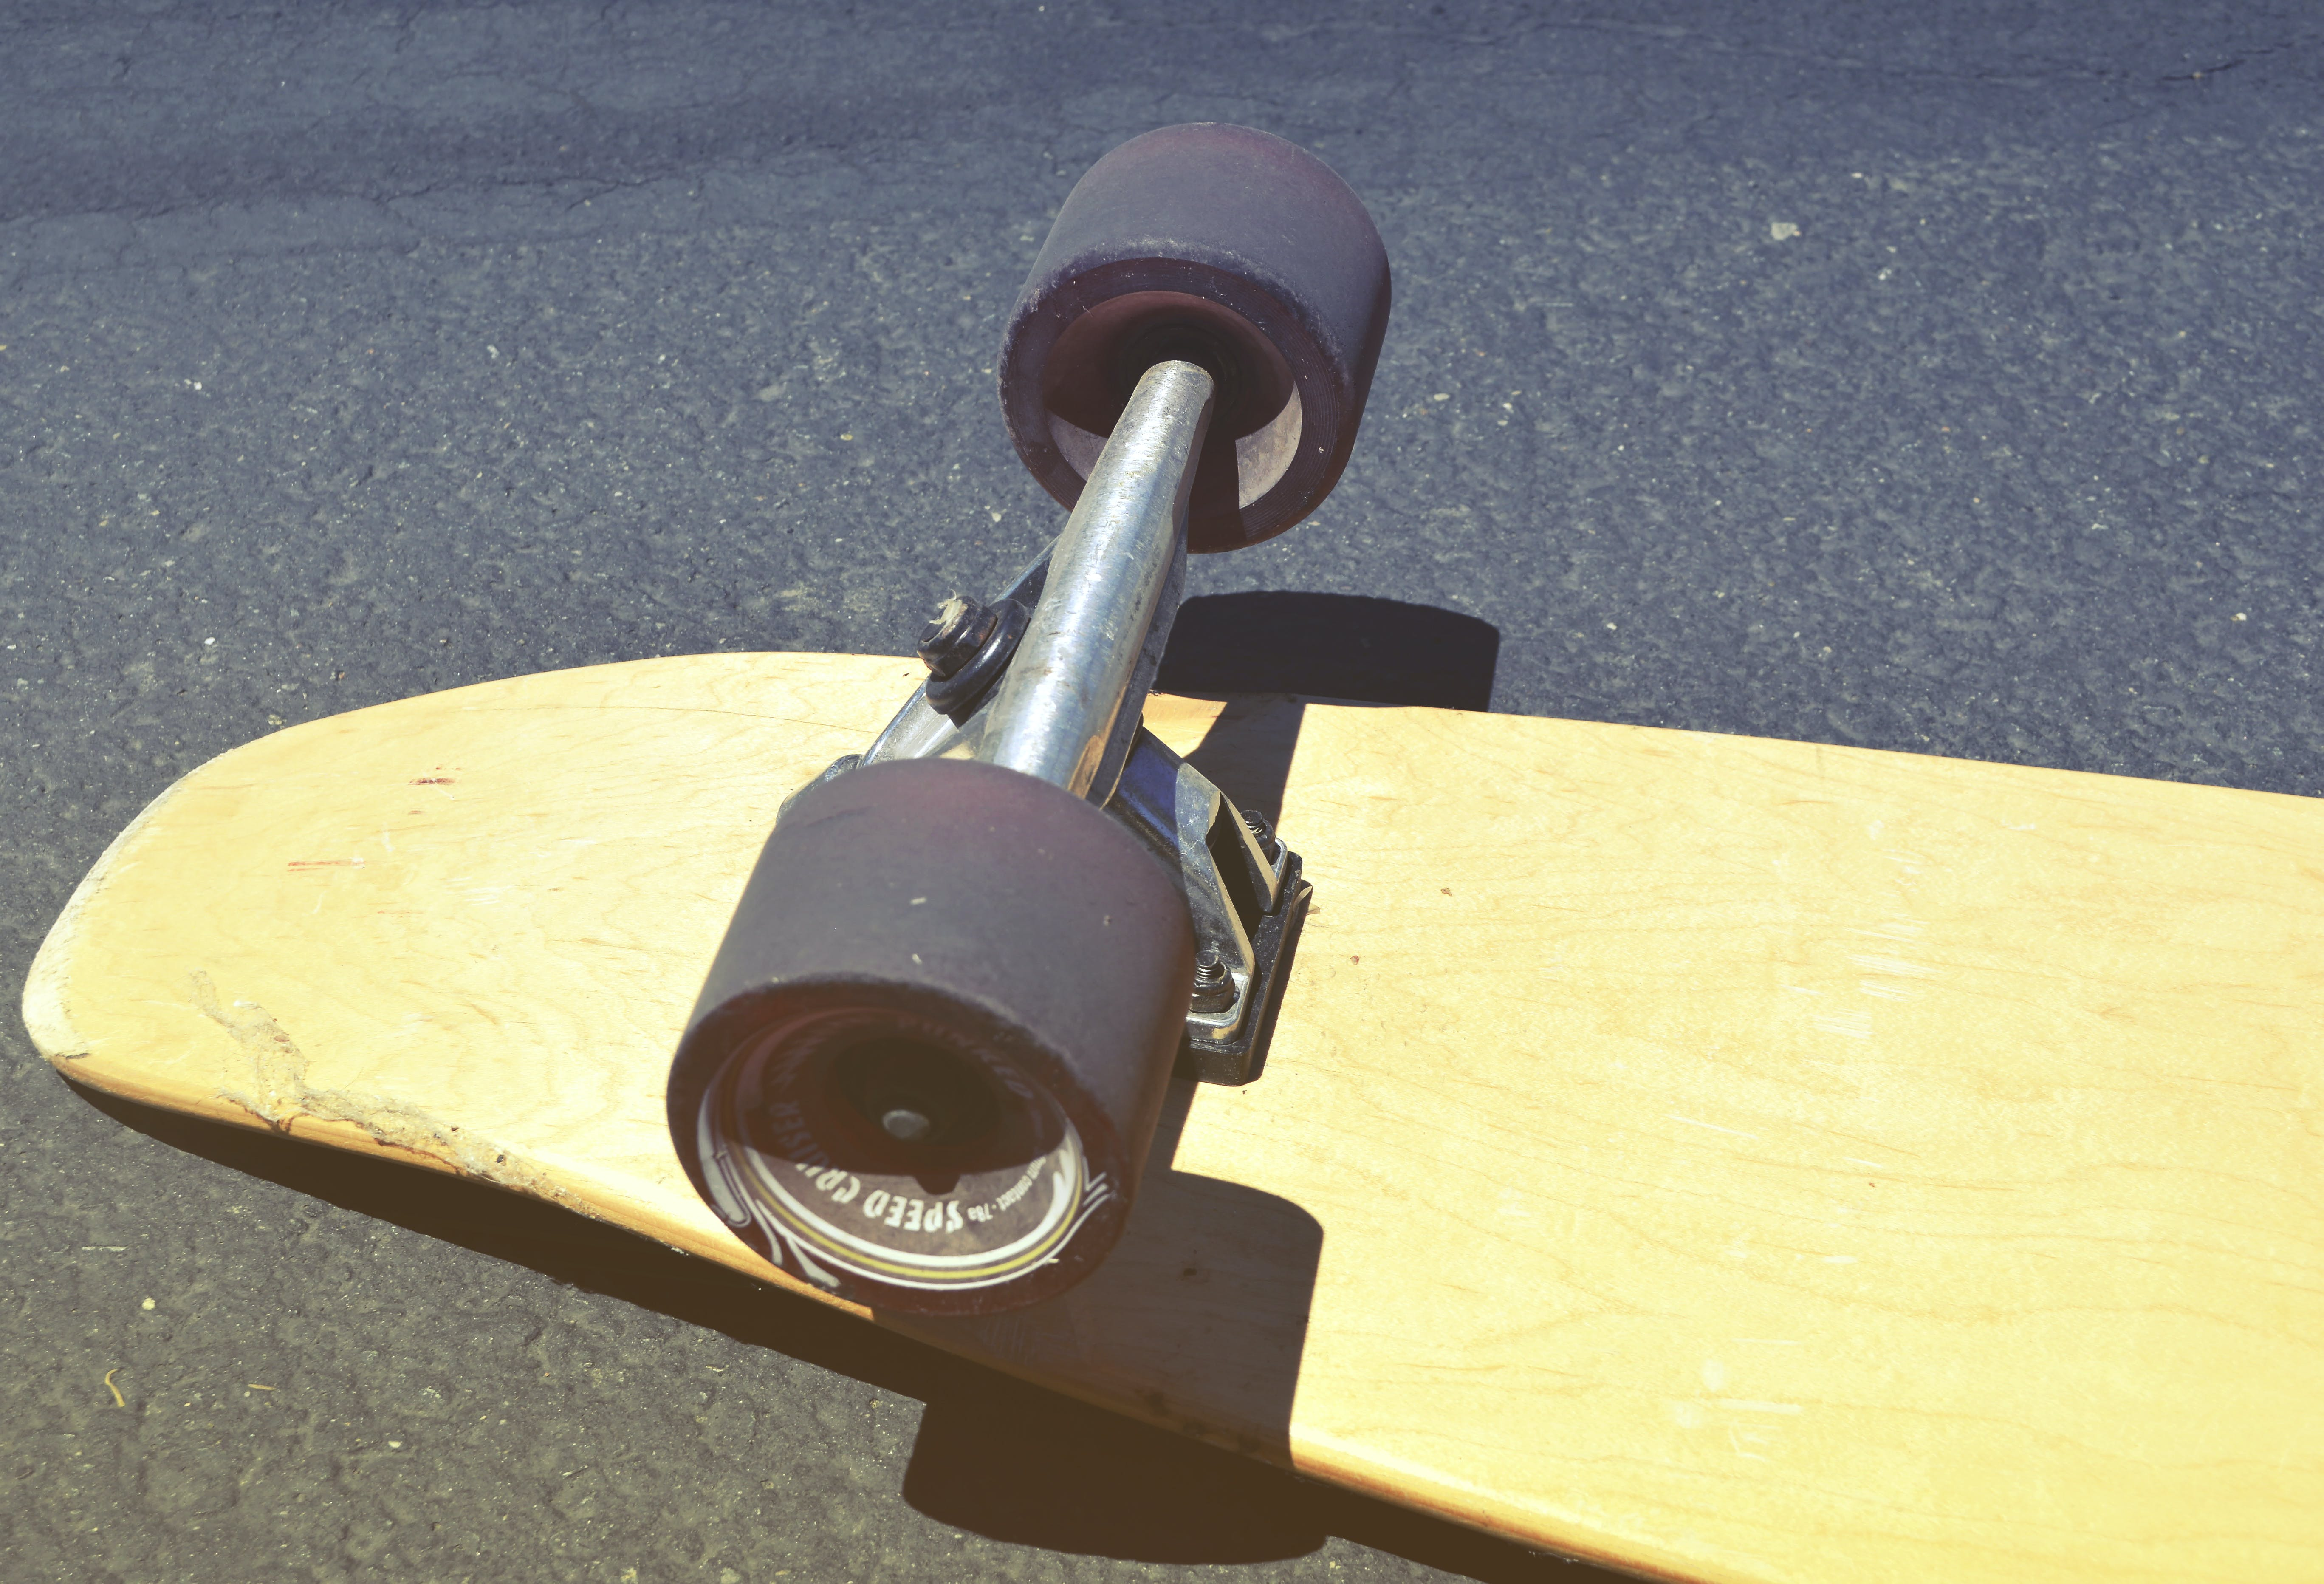 kayu, olahraga, permukaan beton